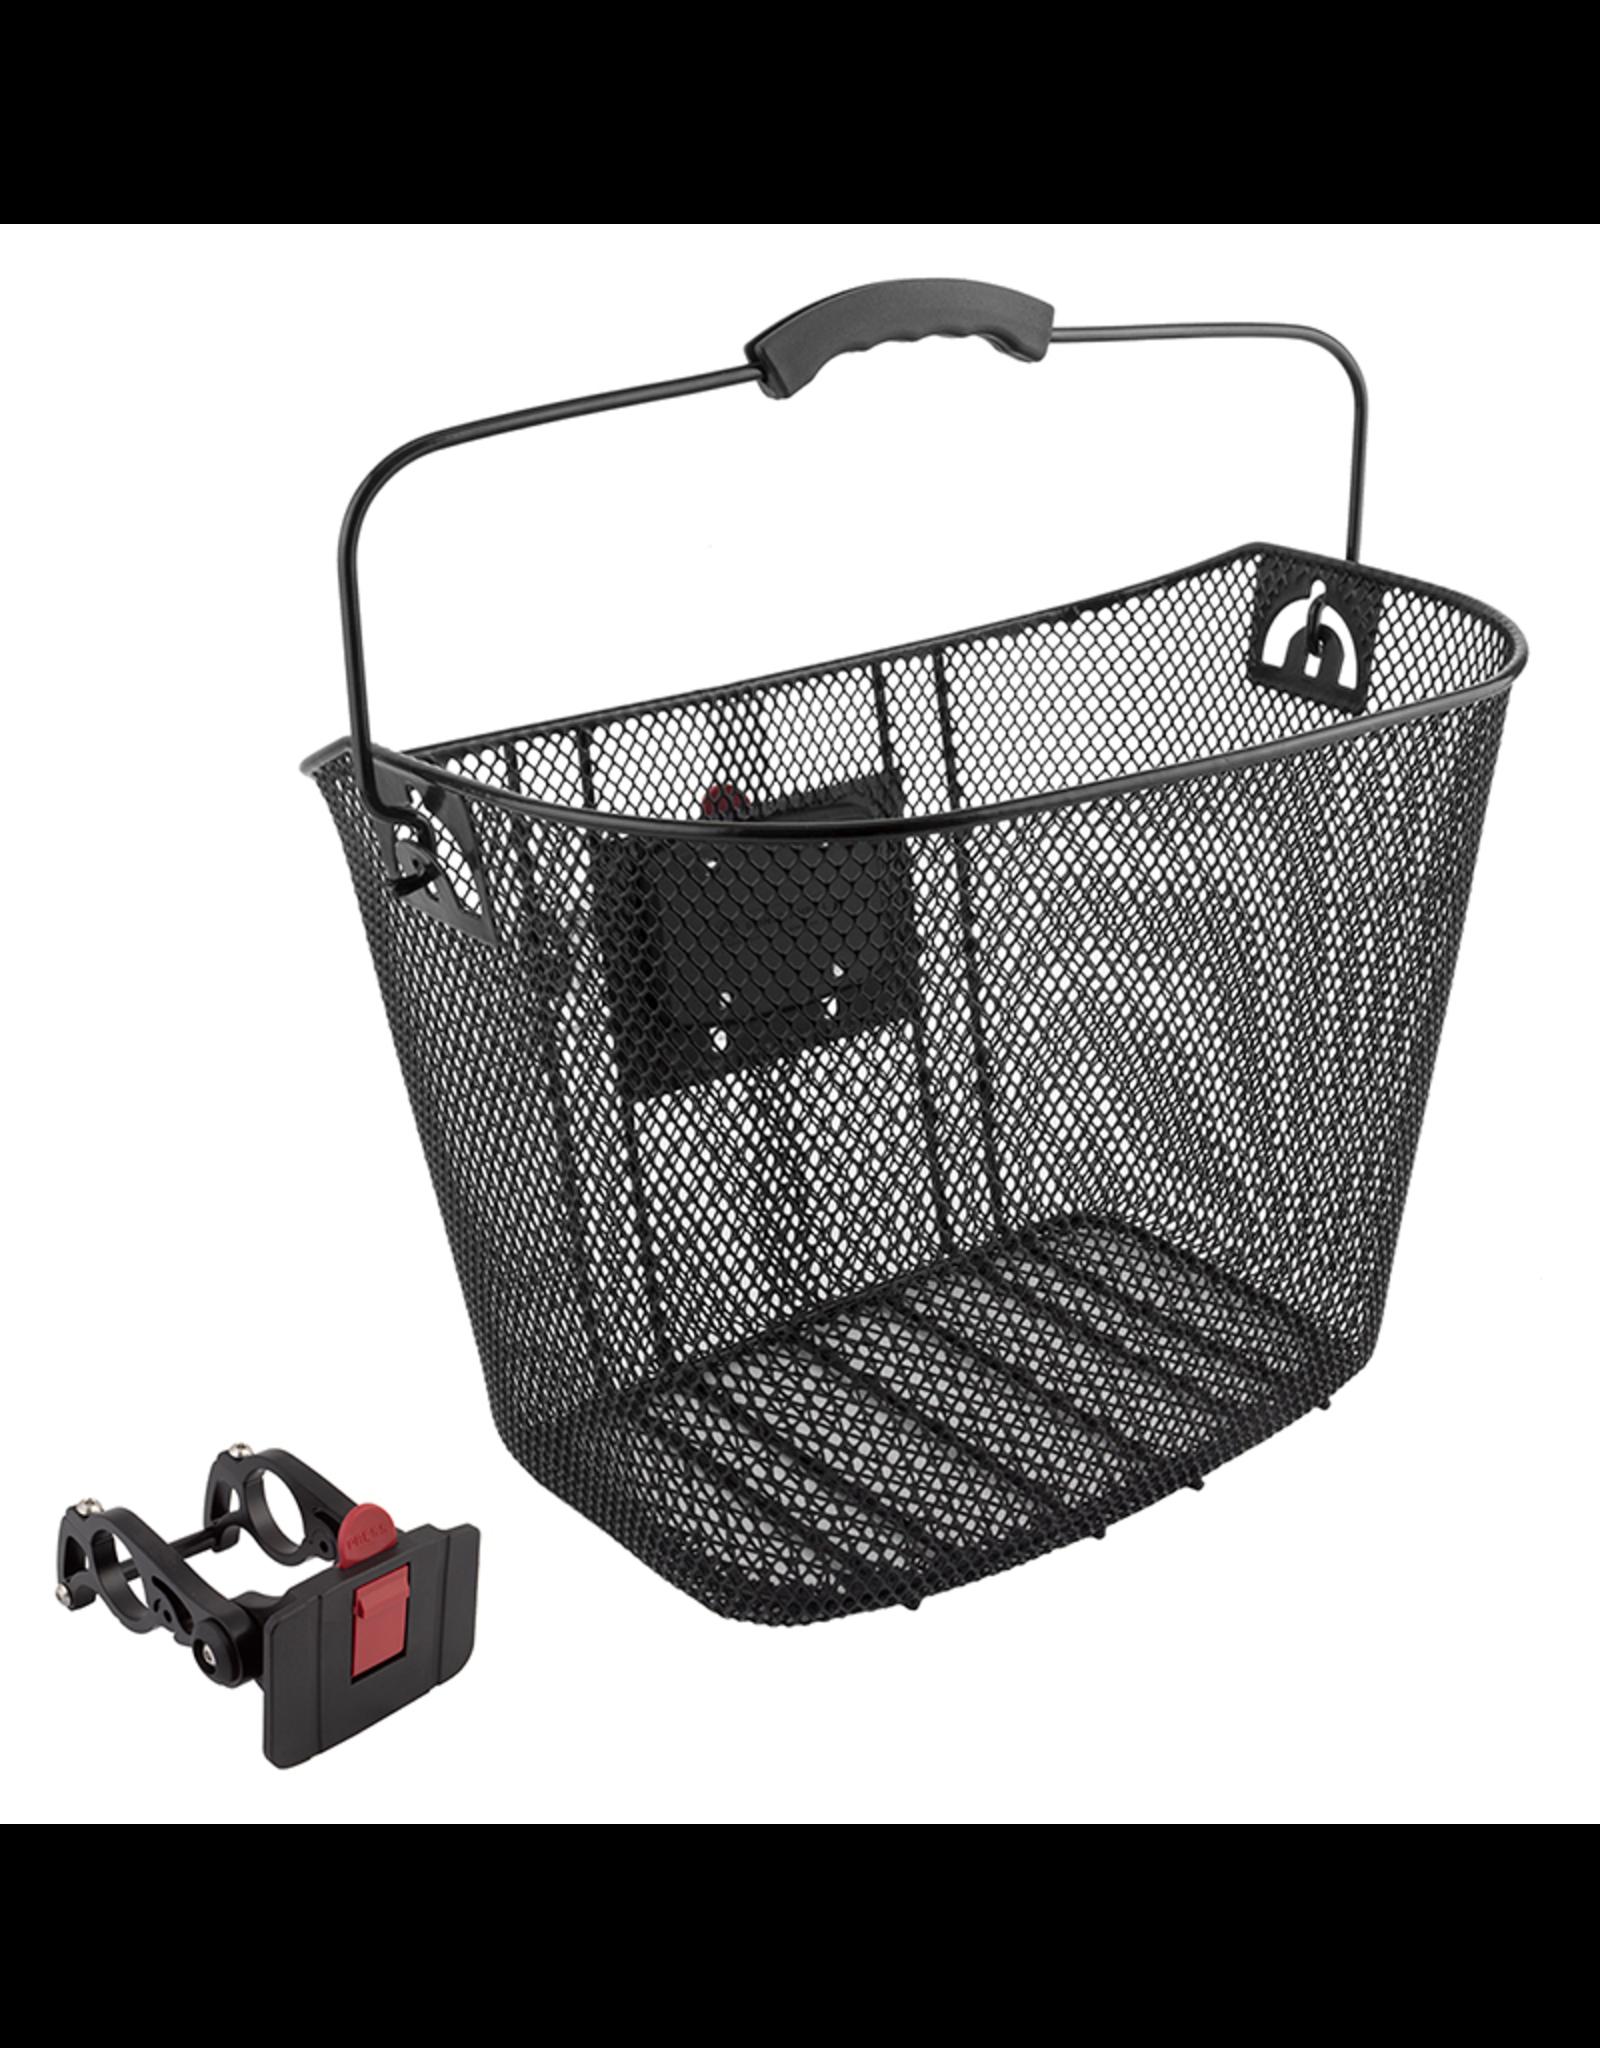 Sunlite Sunlite Front Basket - Mesh QR, Black